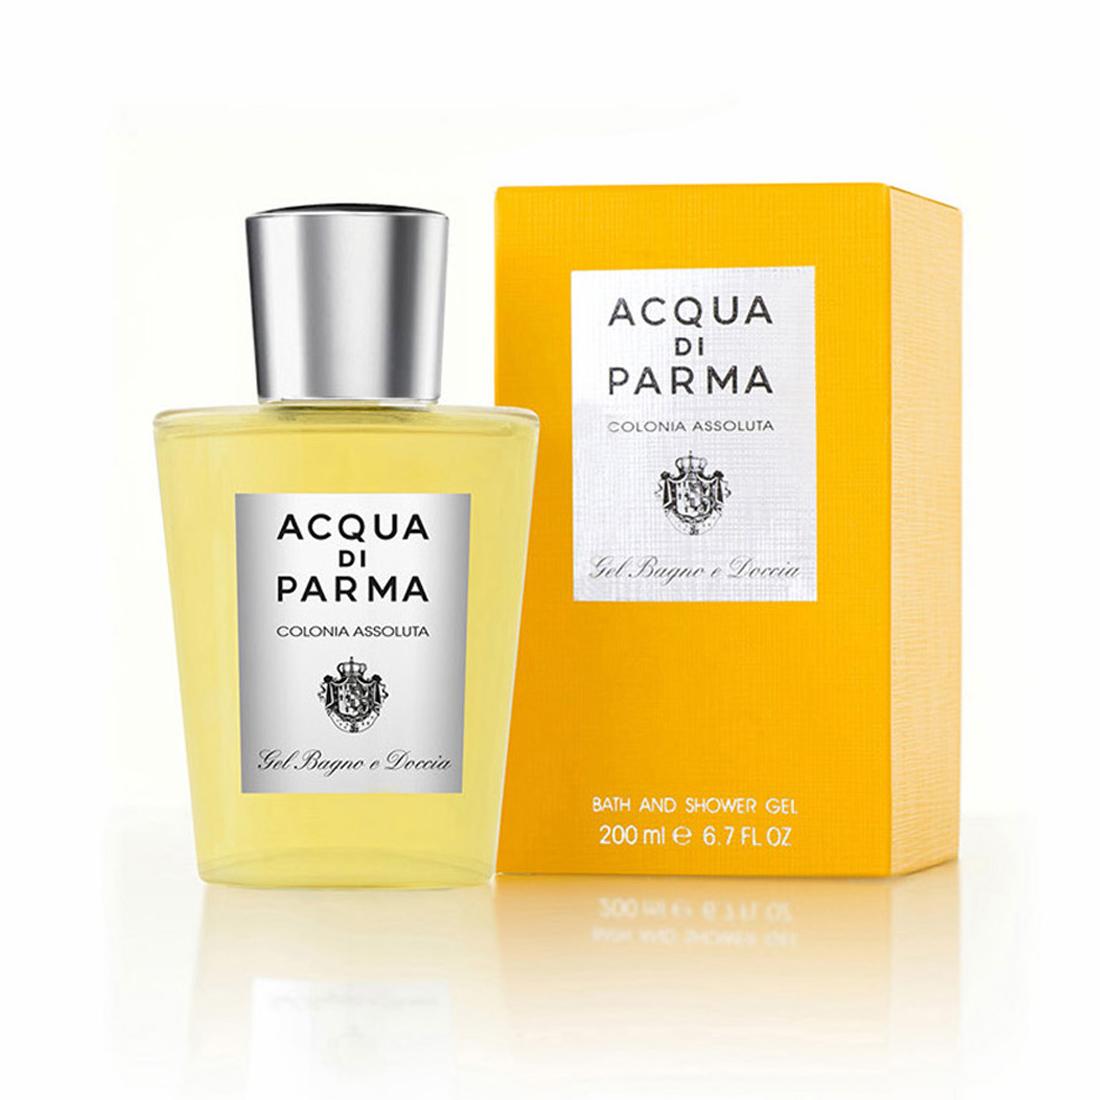 Acqua di Parma - Colonia Assoluta - Gel Douche et Bain 200 ml